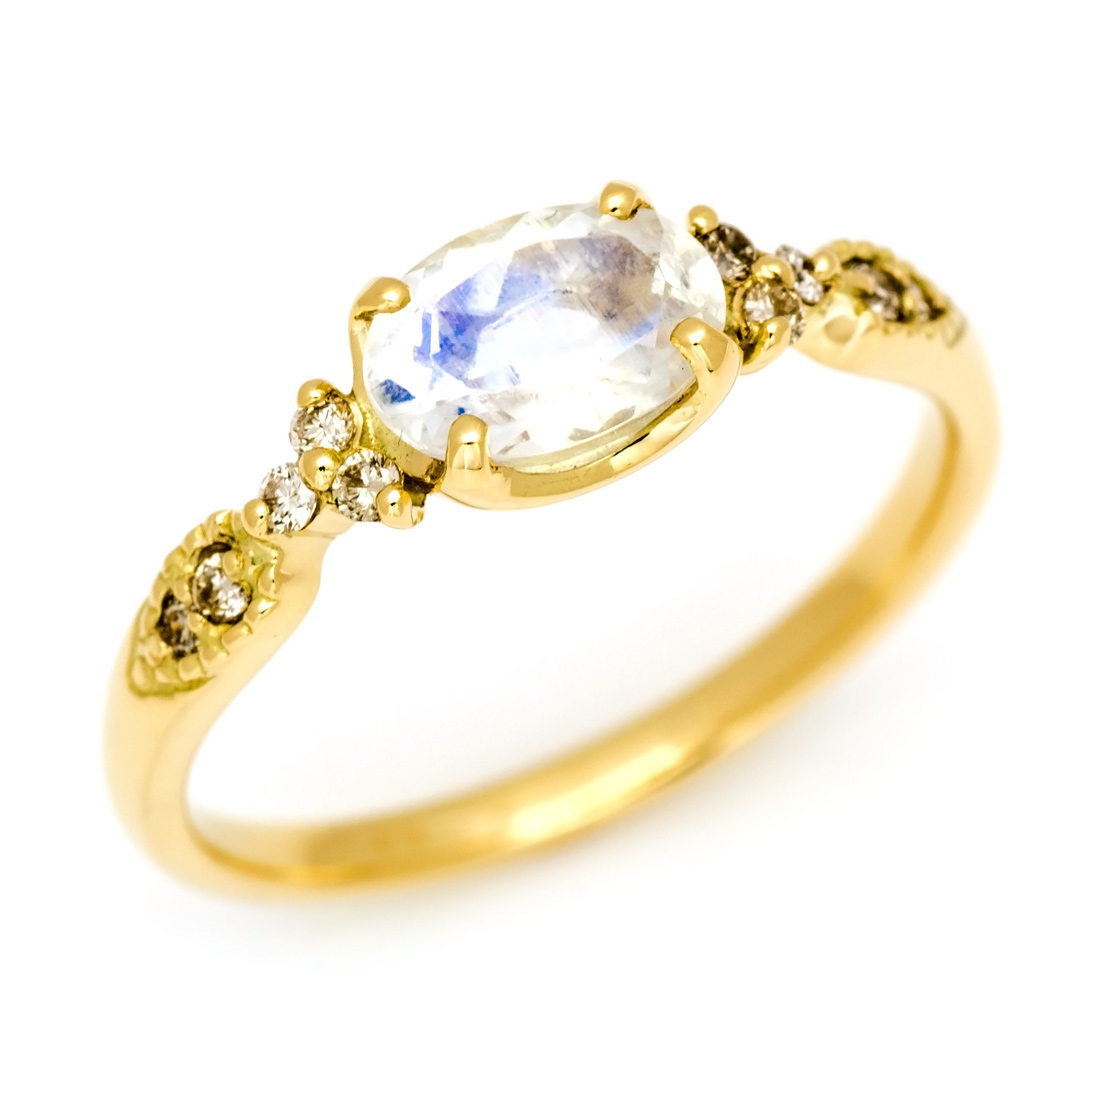 【GWクーポン配布中】リング ブルームーンストーン ダイヤモンド ゴールド K18 「amanza」 送料無料